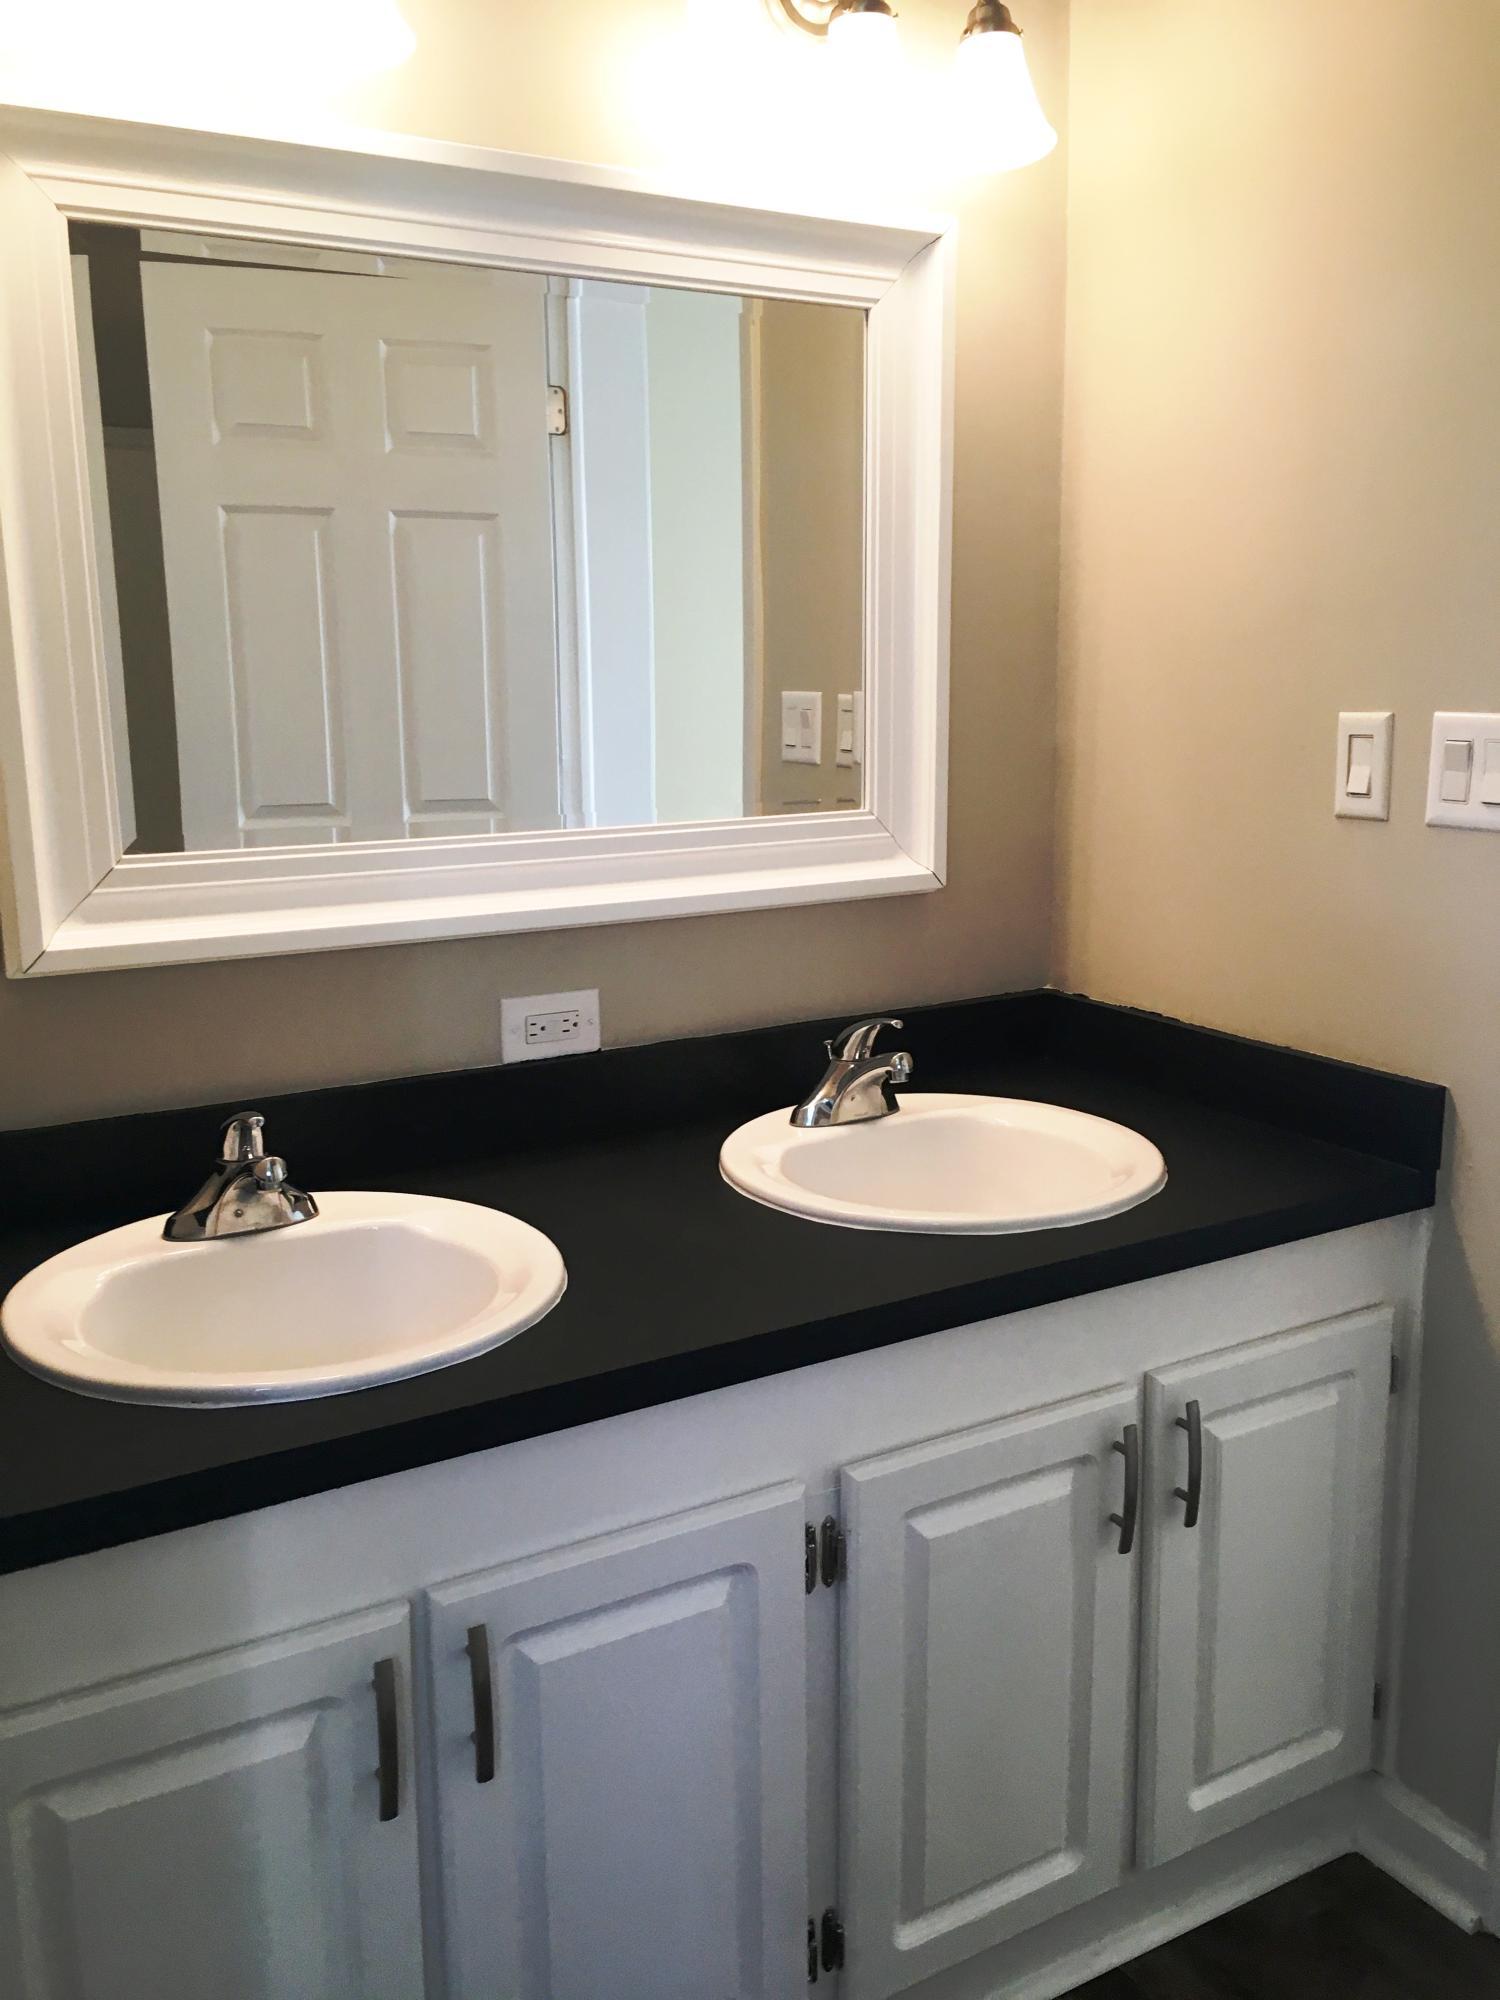 None Homes For Sale - 232 Chance, Cottageville, SC - 17